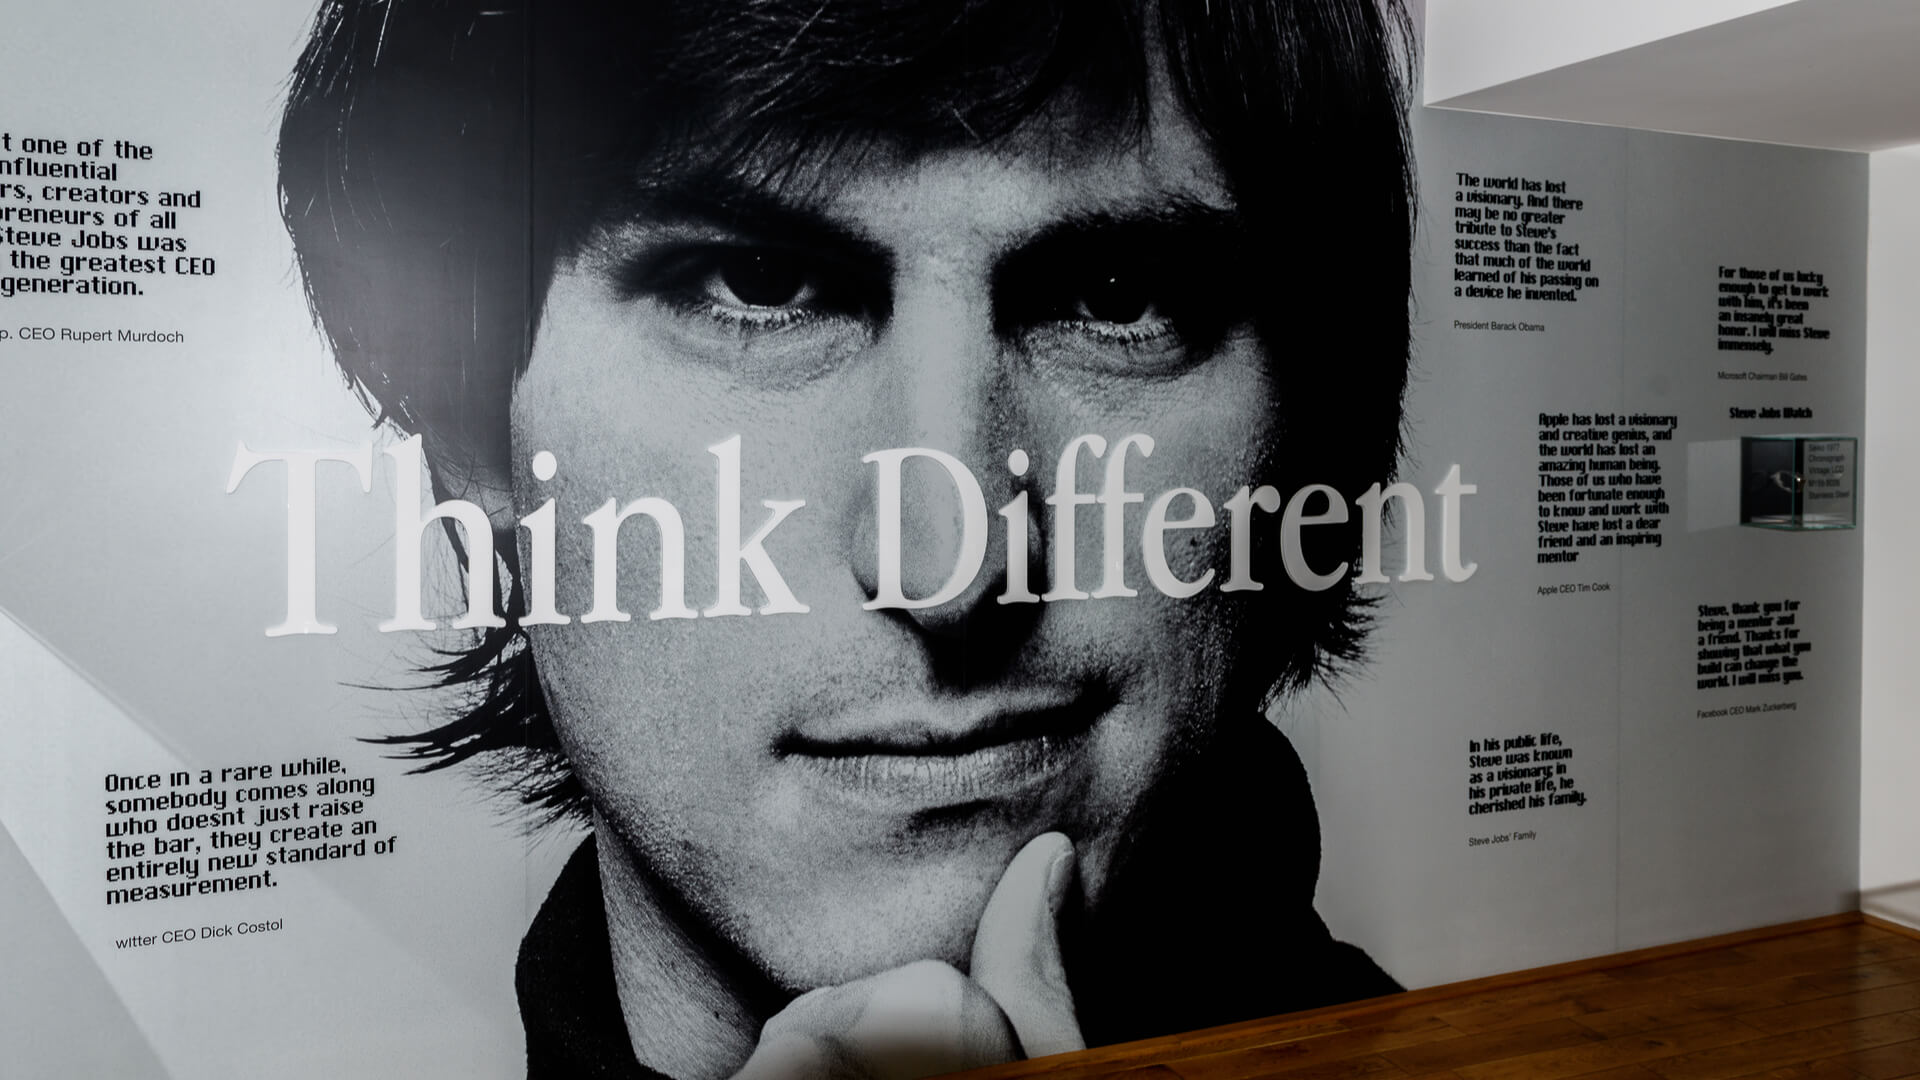 Steve Jobs: develop new products like Steve Jobs